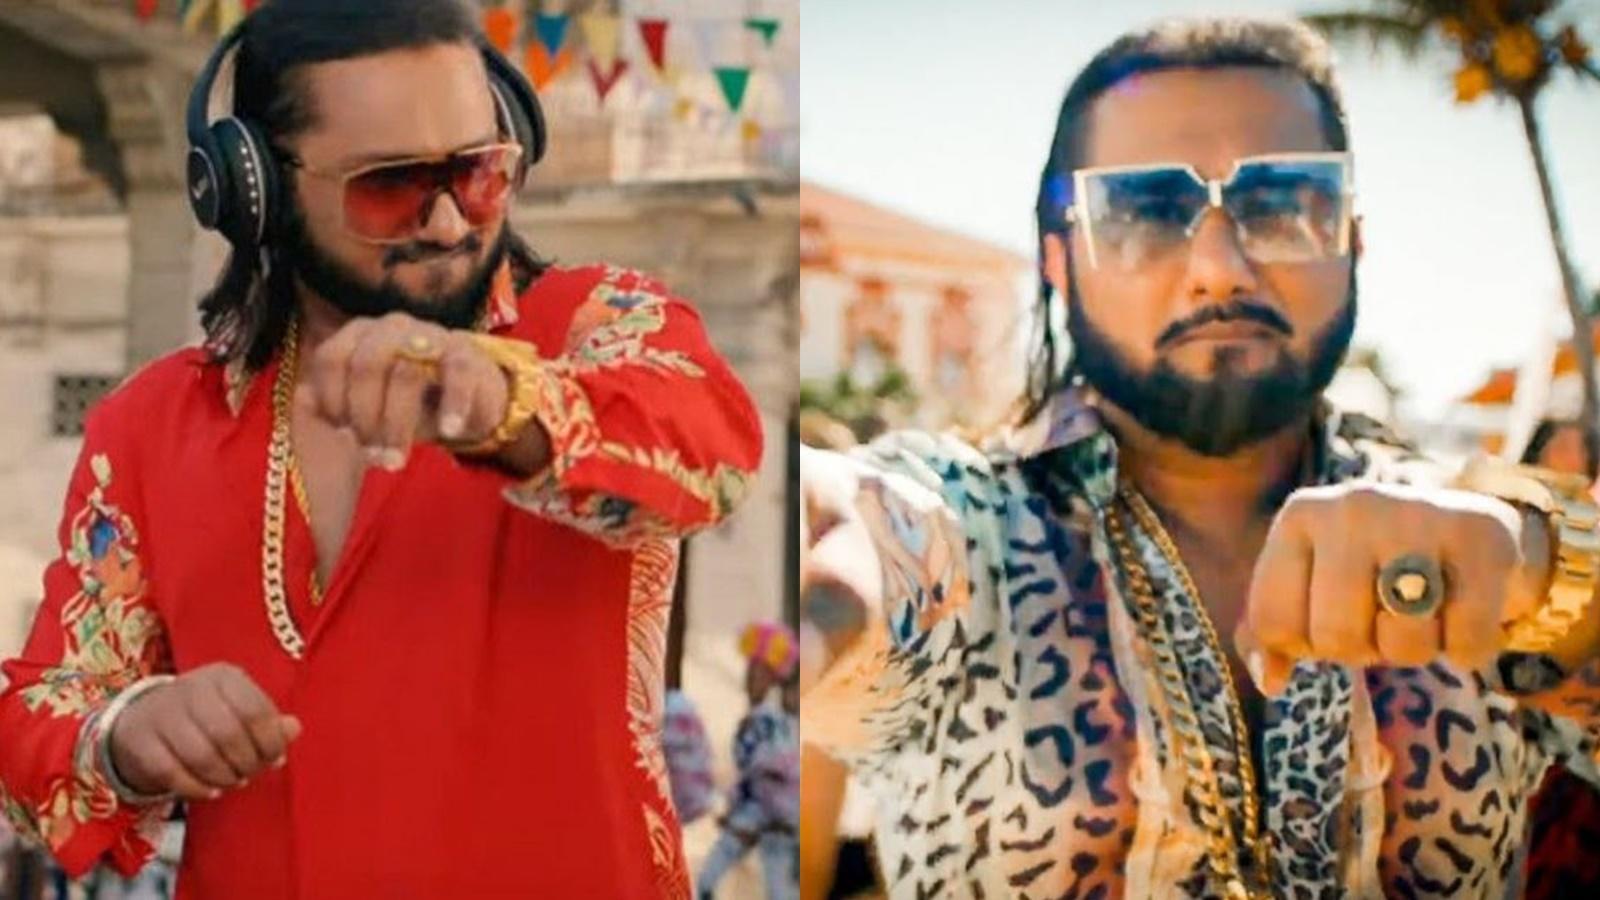 Yo Yo Honey Singh lands in trouble yet again for 'vulgar' lyrics in  'Makhna' song